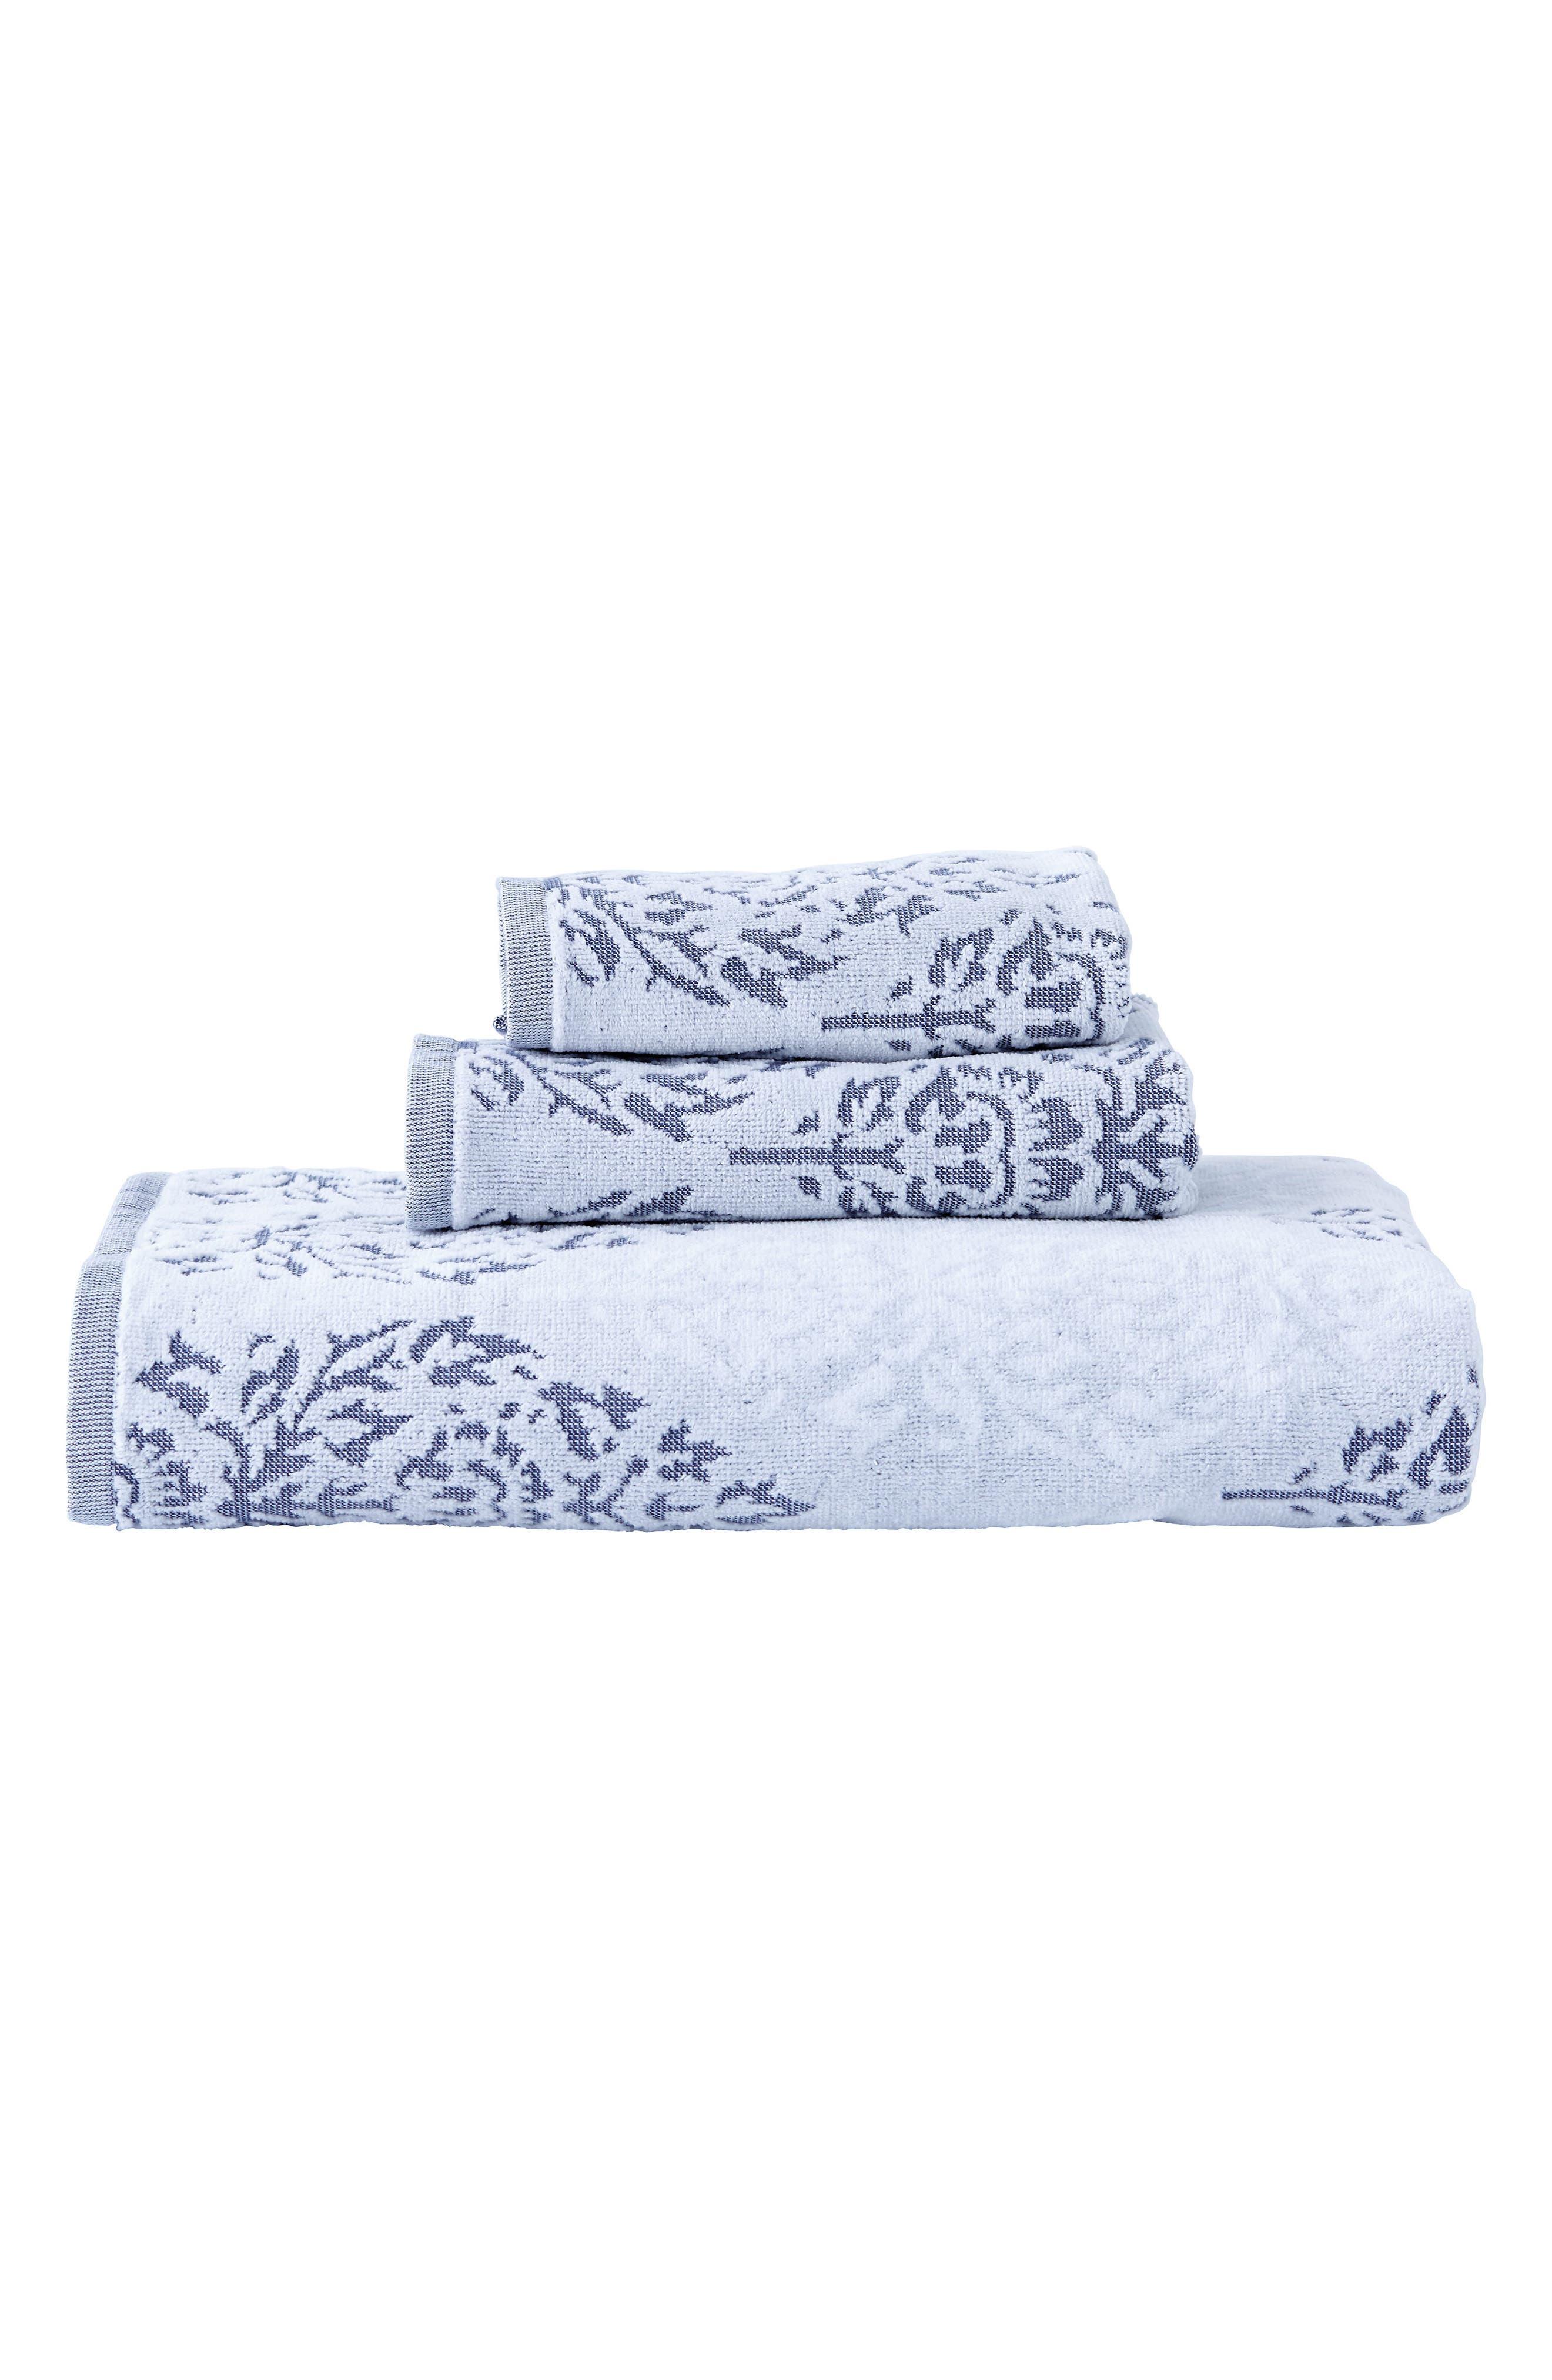 Jalati Hand Towel,                             Alternate thumbnail 2, color,                             Indigo